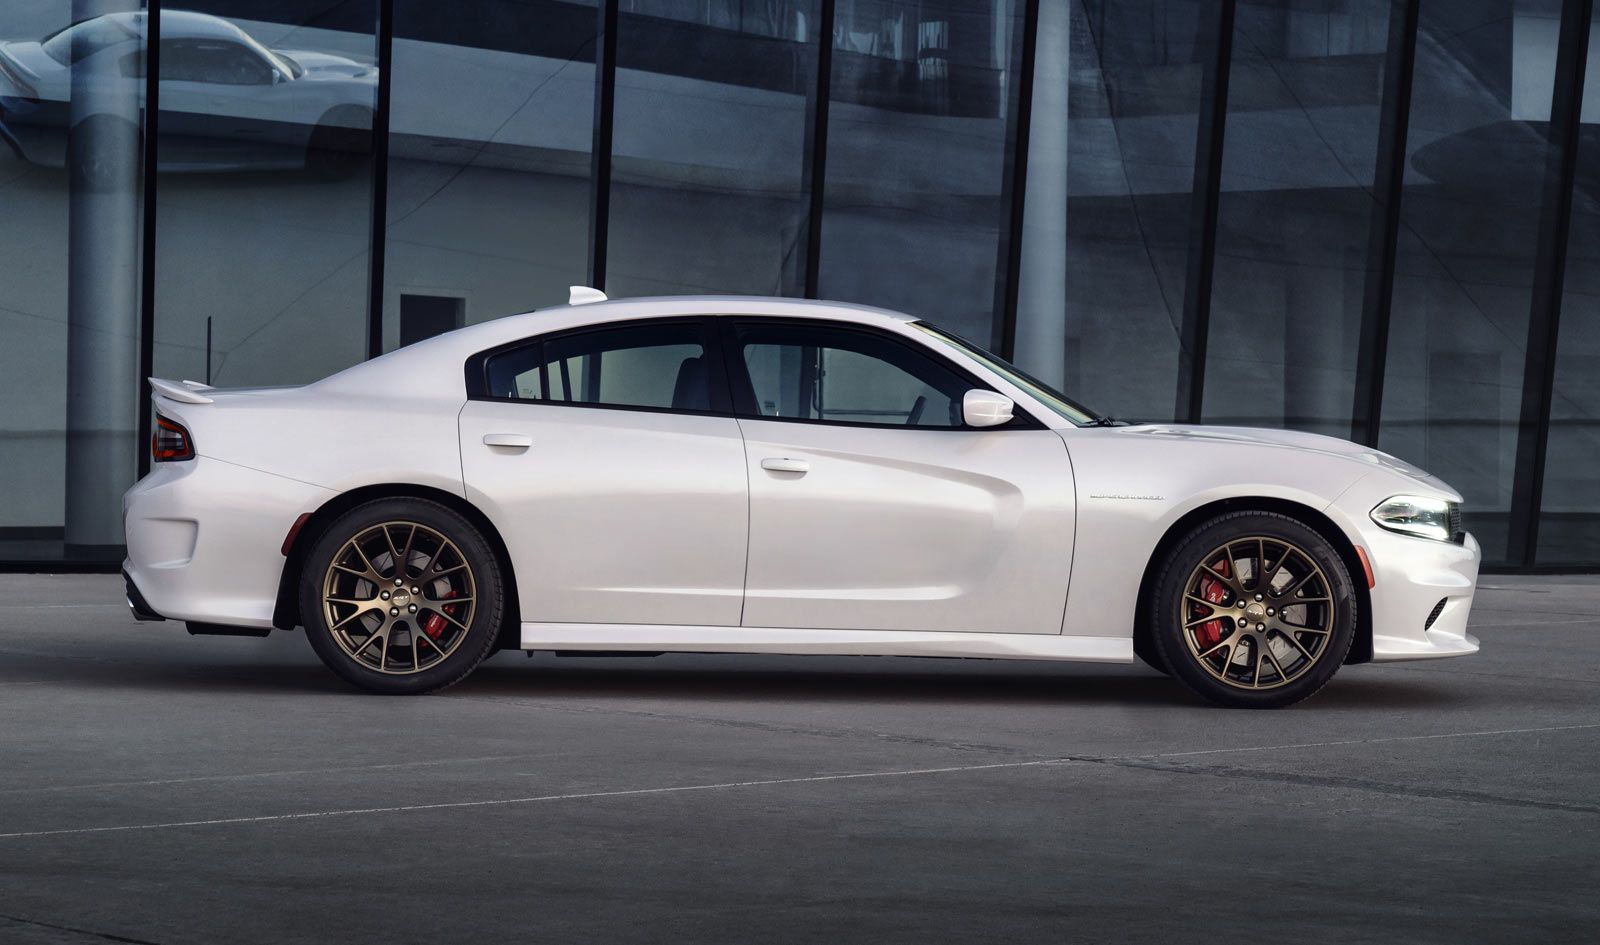 2015 Dodge Charger SRT Hellcat | DriveSRT